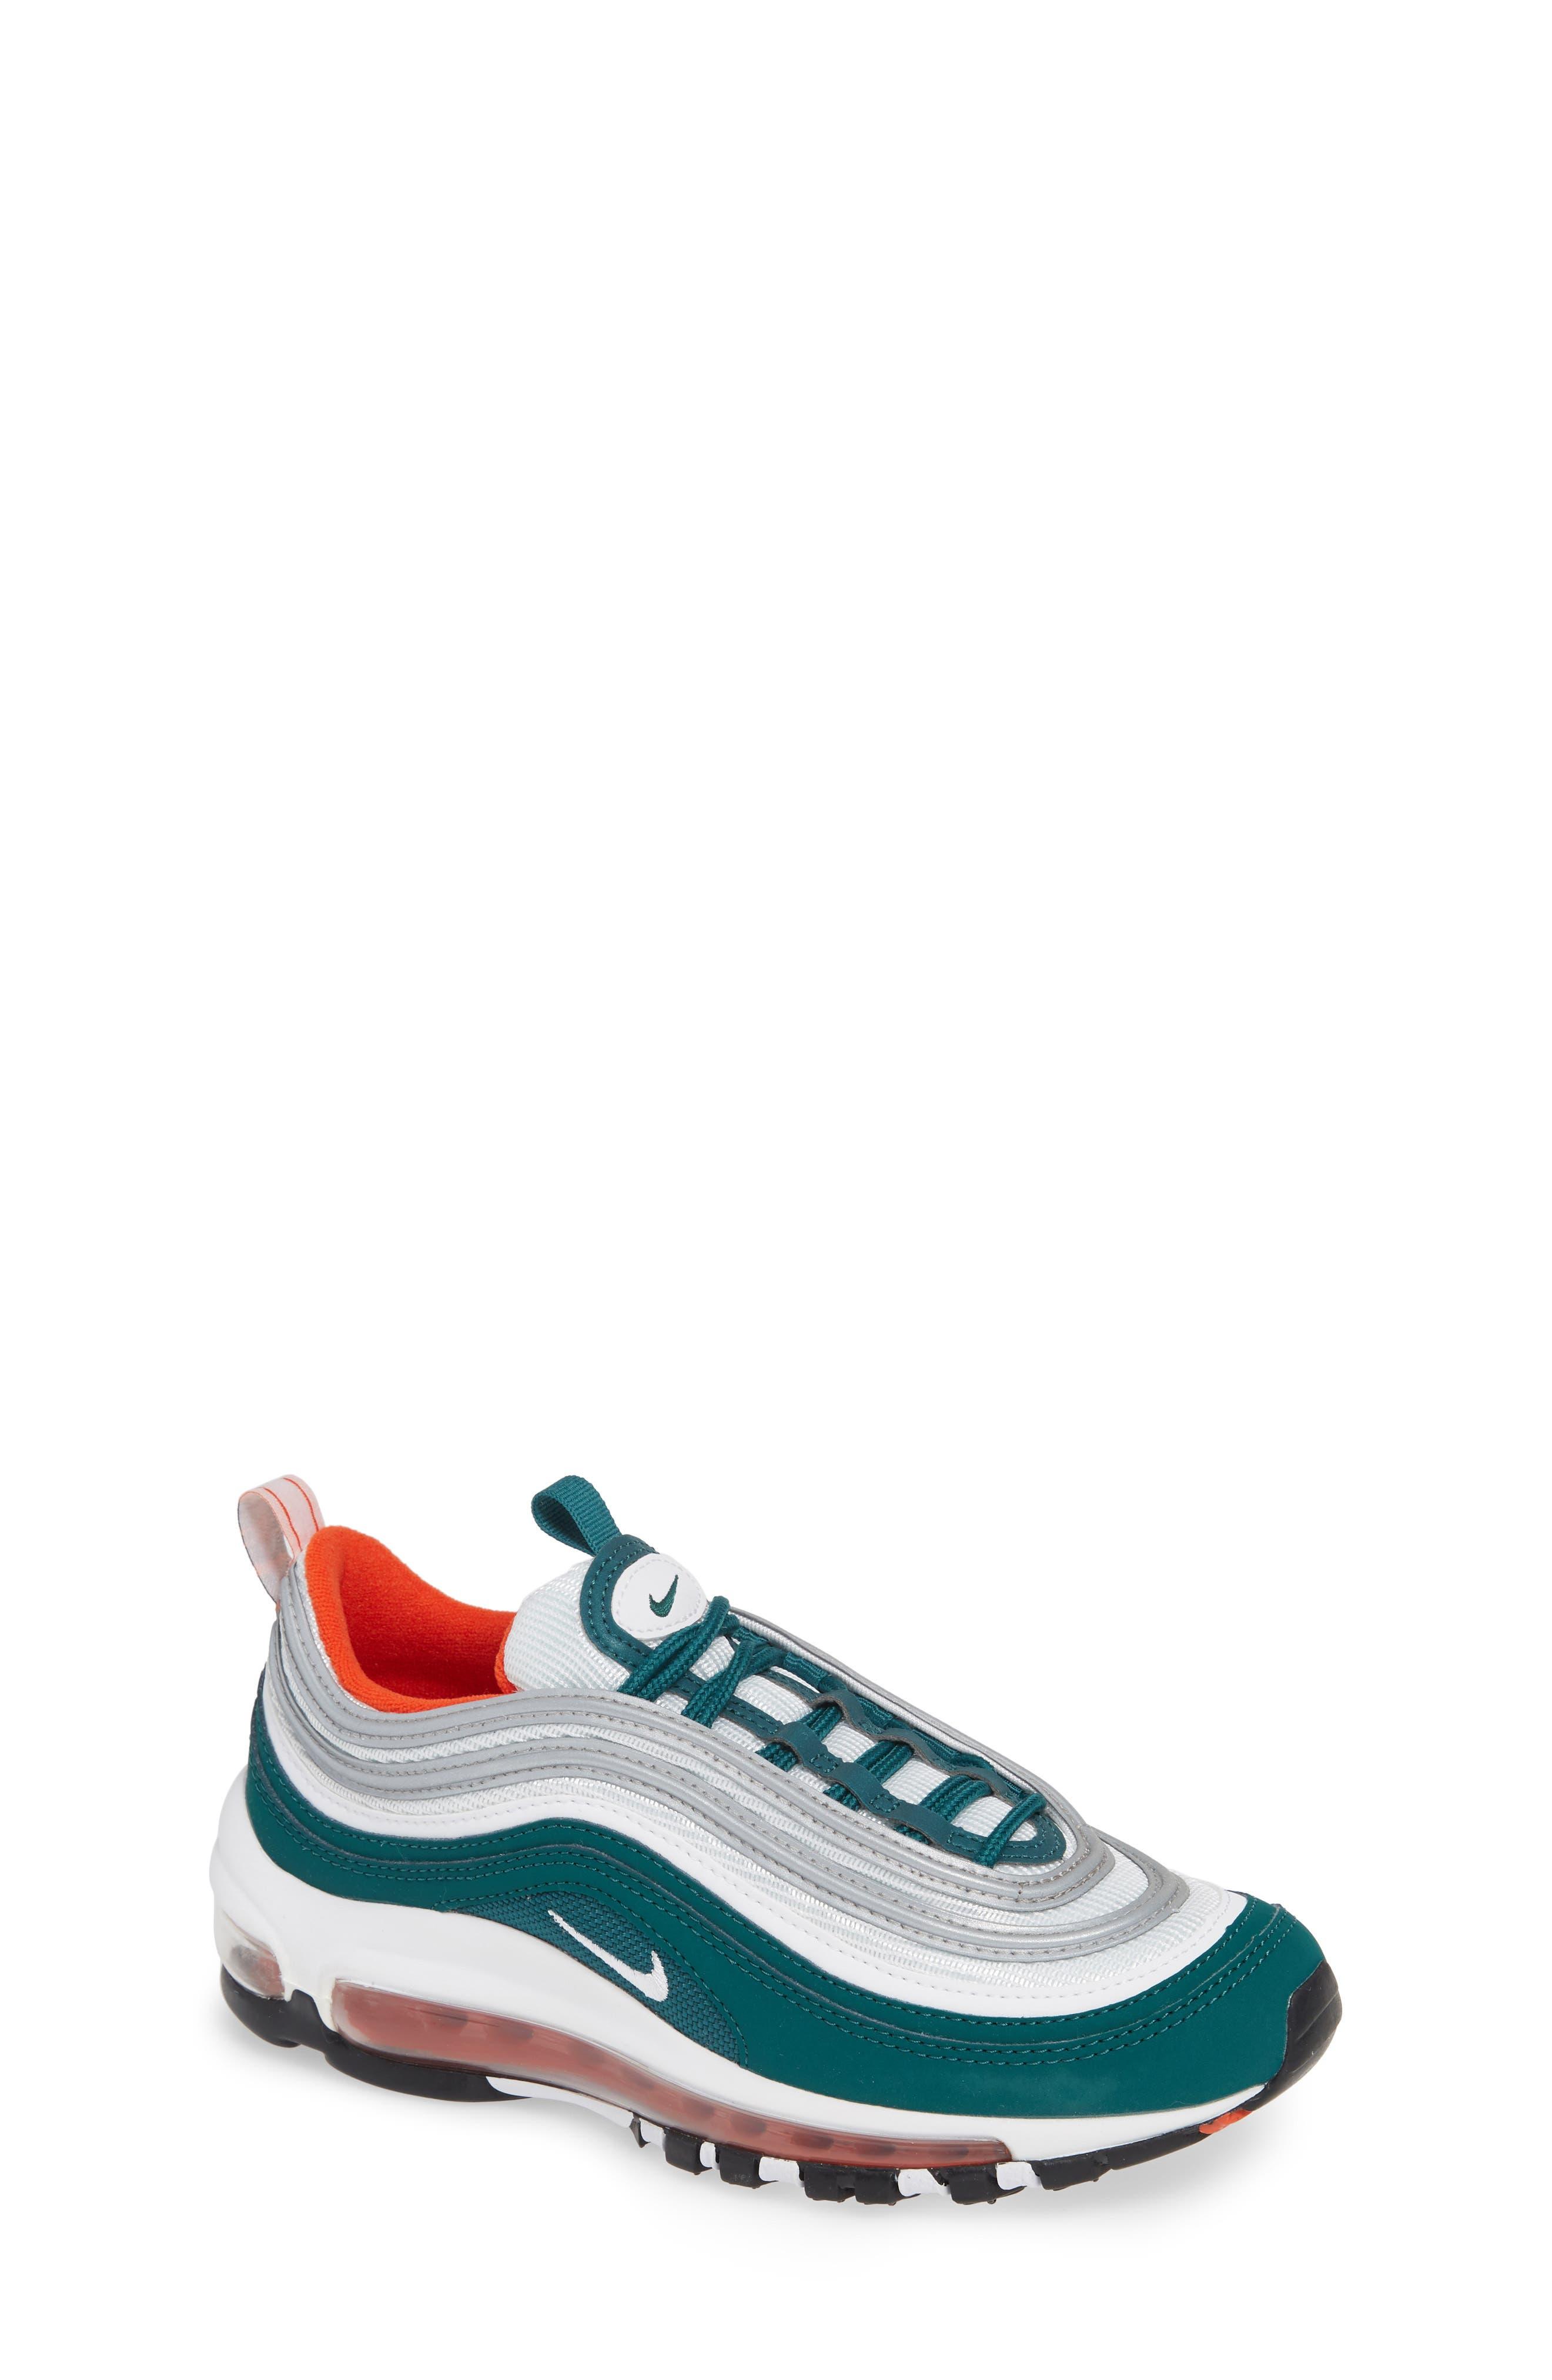 NIKE,                             Air Max 97 Sneaker,                             Main thumbnail 1, color,                             RAINFOREST/ WHITE/ ORANGE